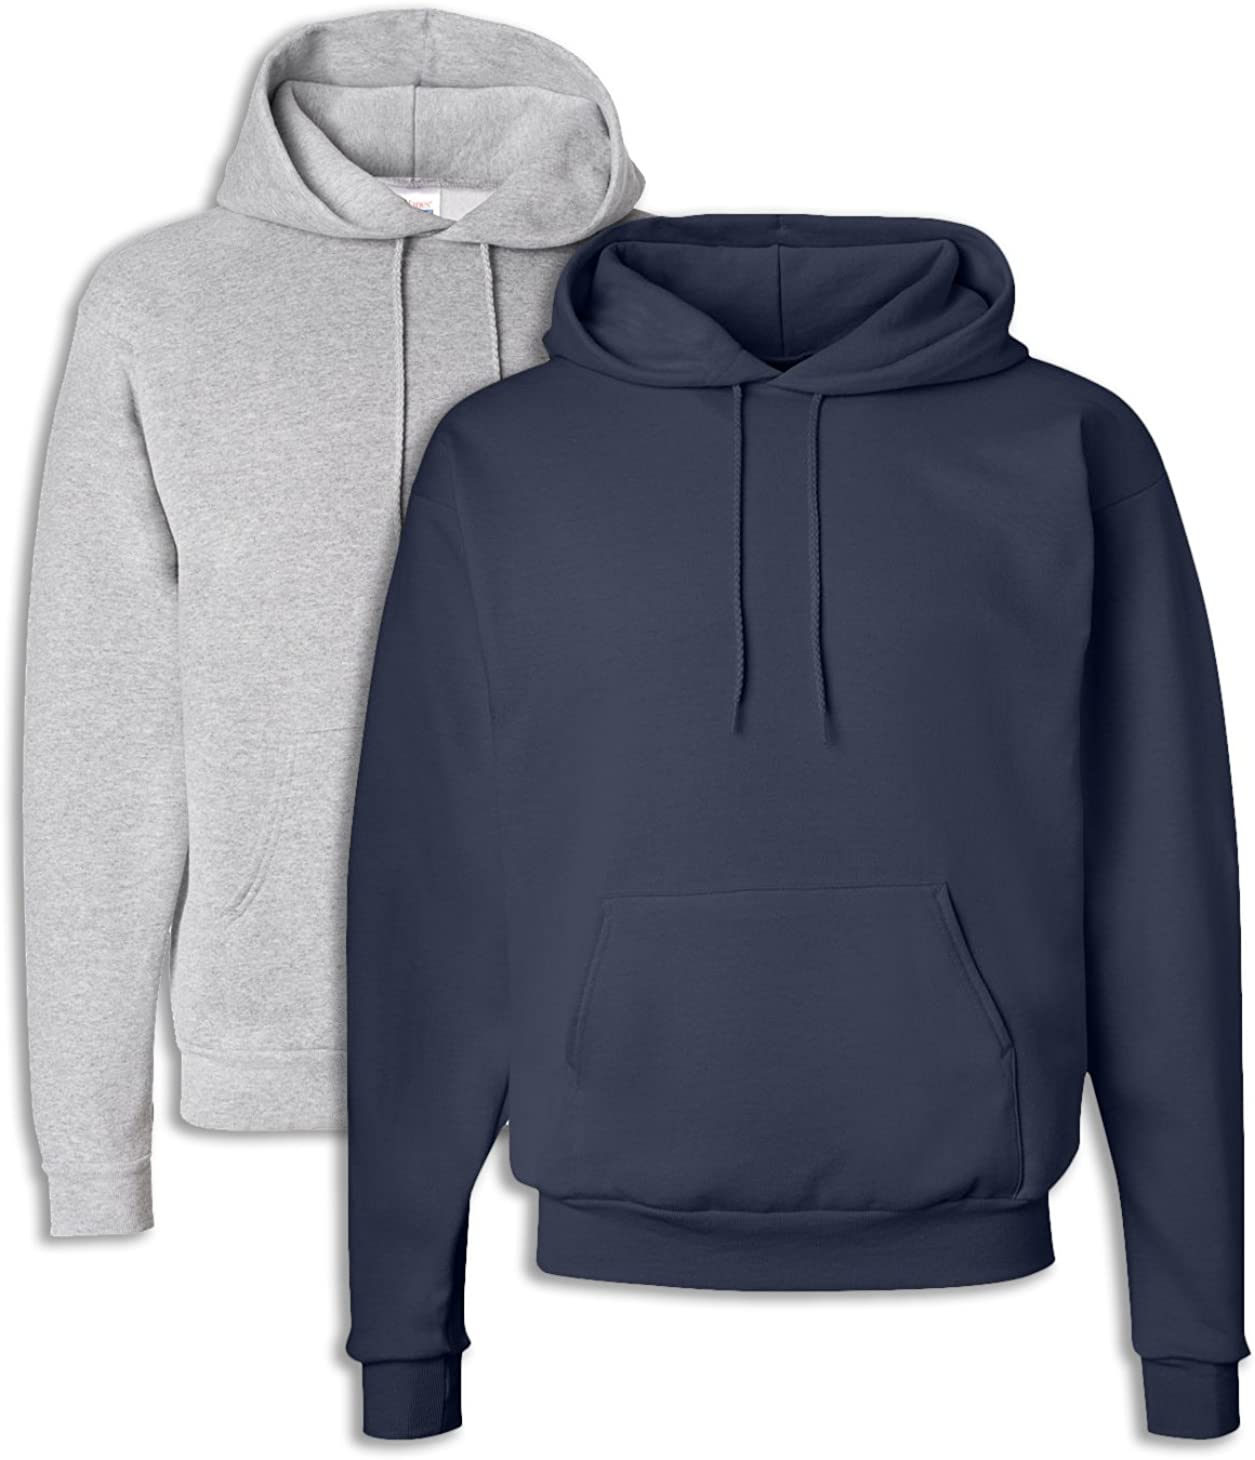 1 Navy Hanes P170 Mens EcoSmart Hooded Sweatshirt 2XL 1 Light Steel